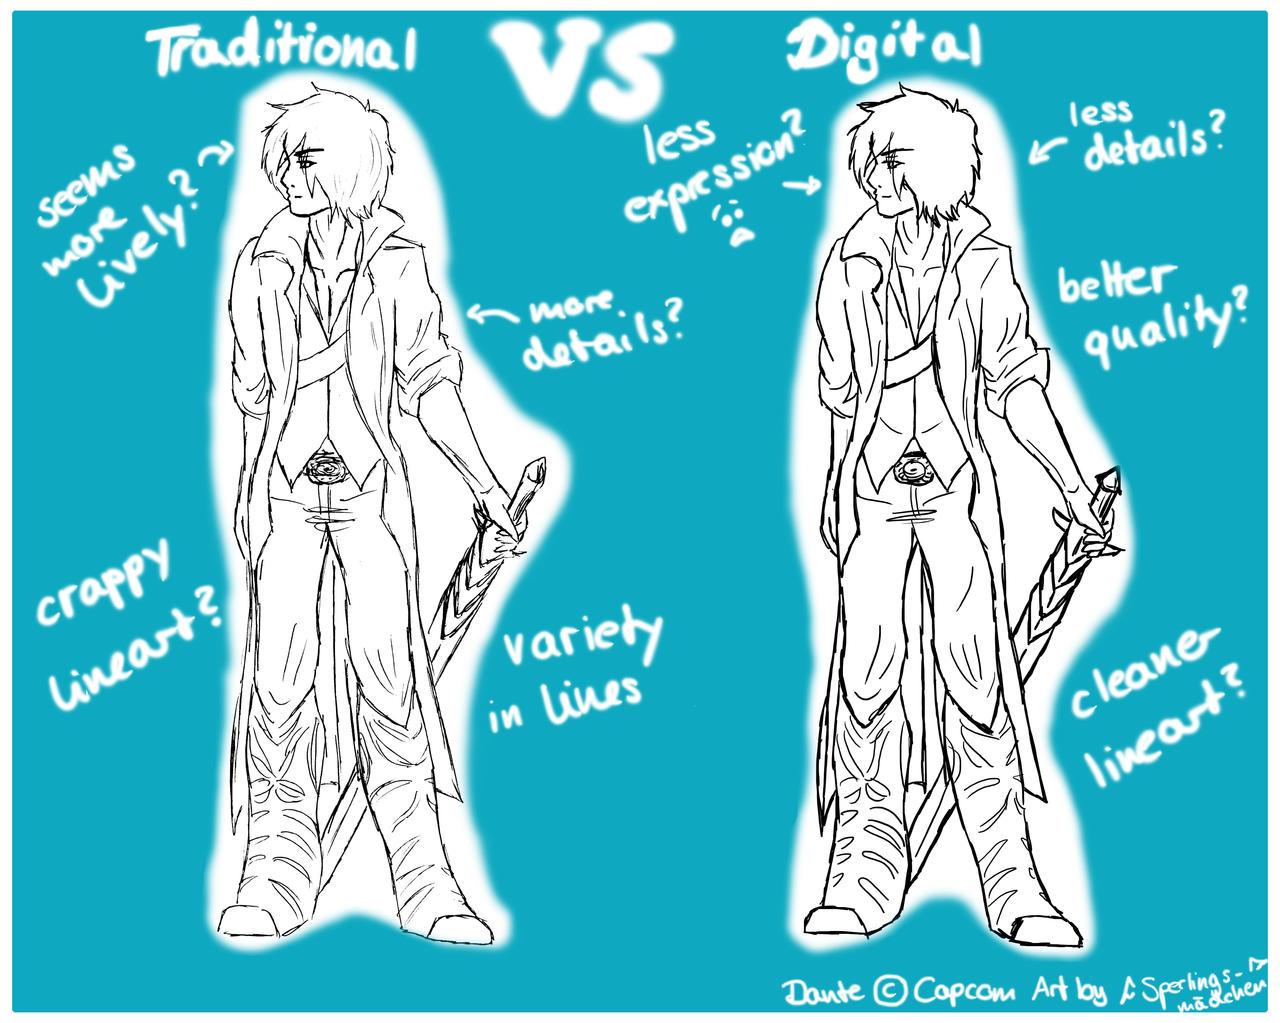 Traditional or Digital?